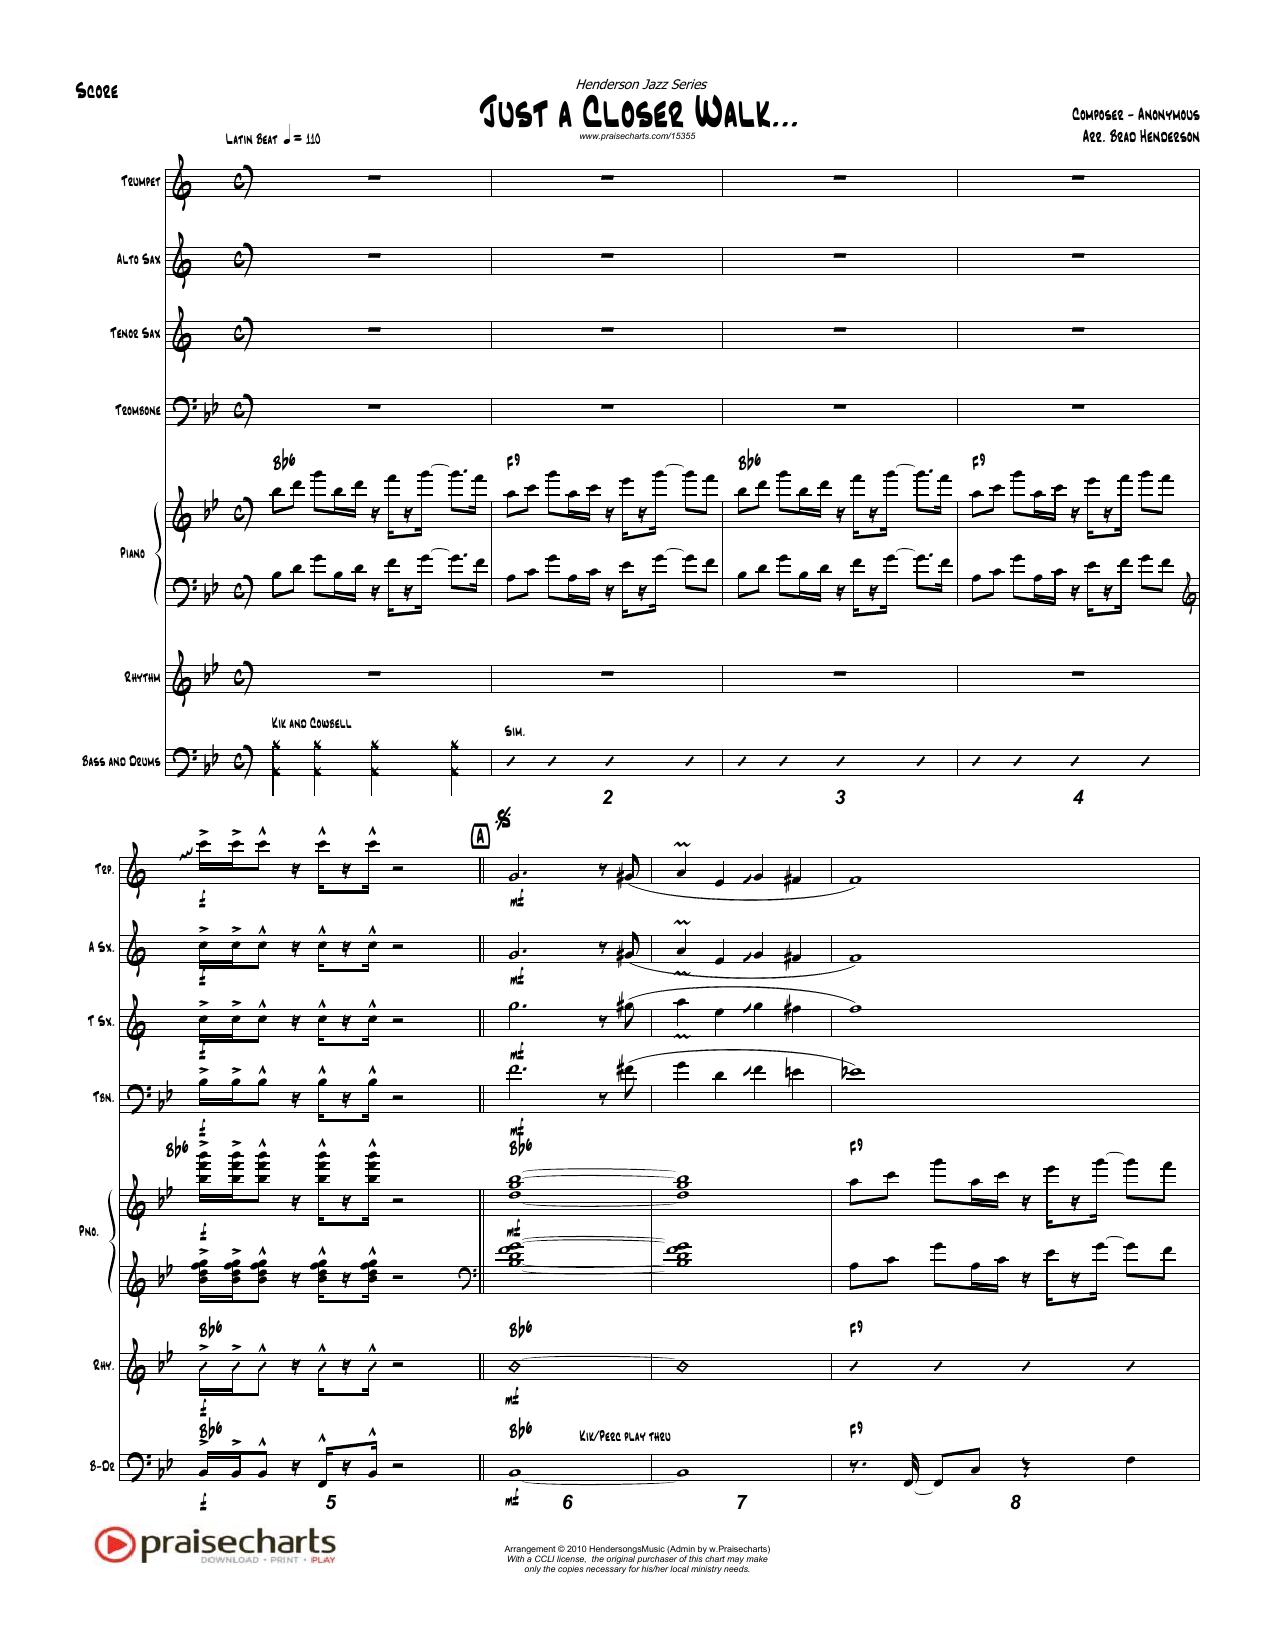 Just A Closer Walk - Orchestration